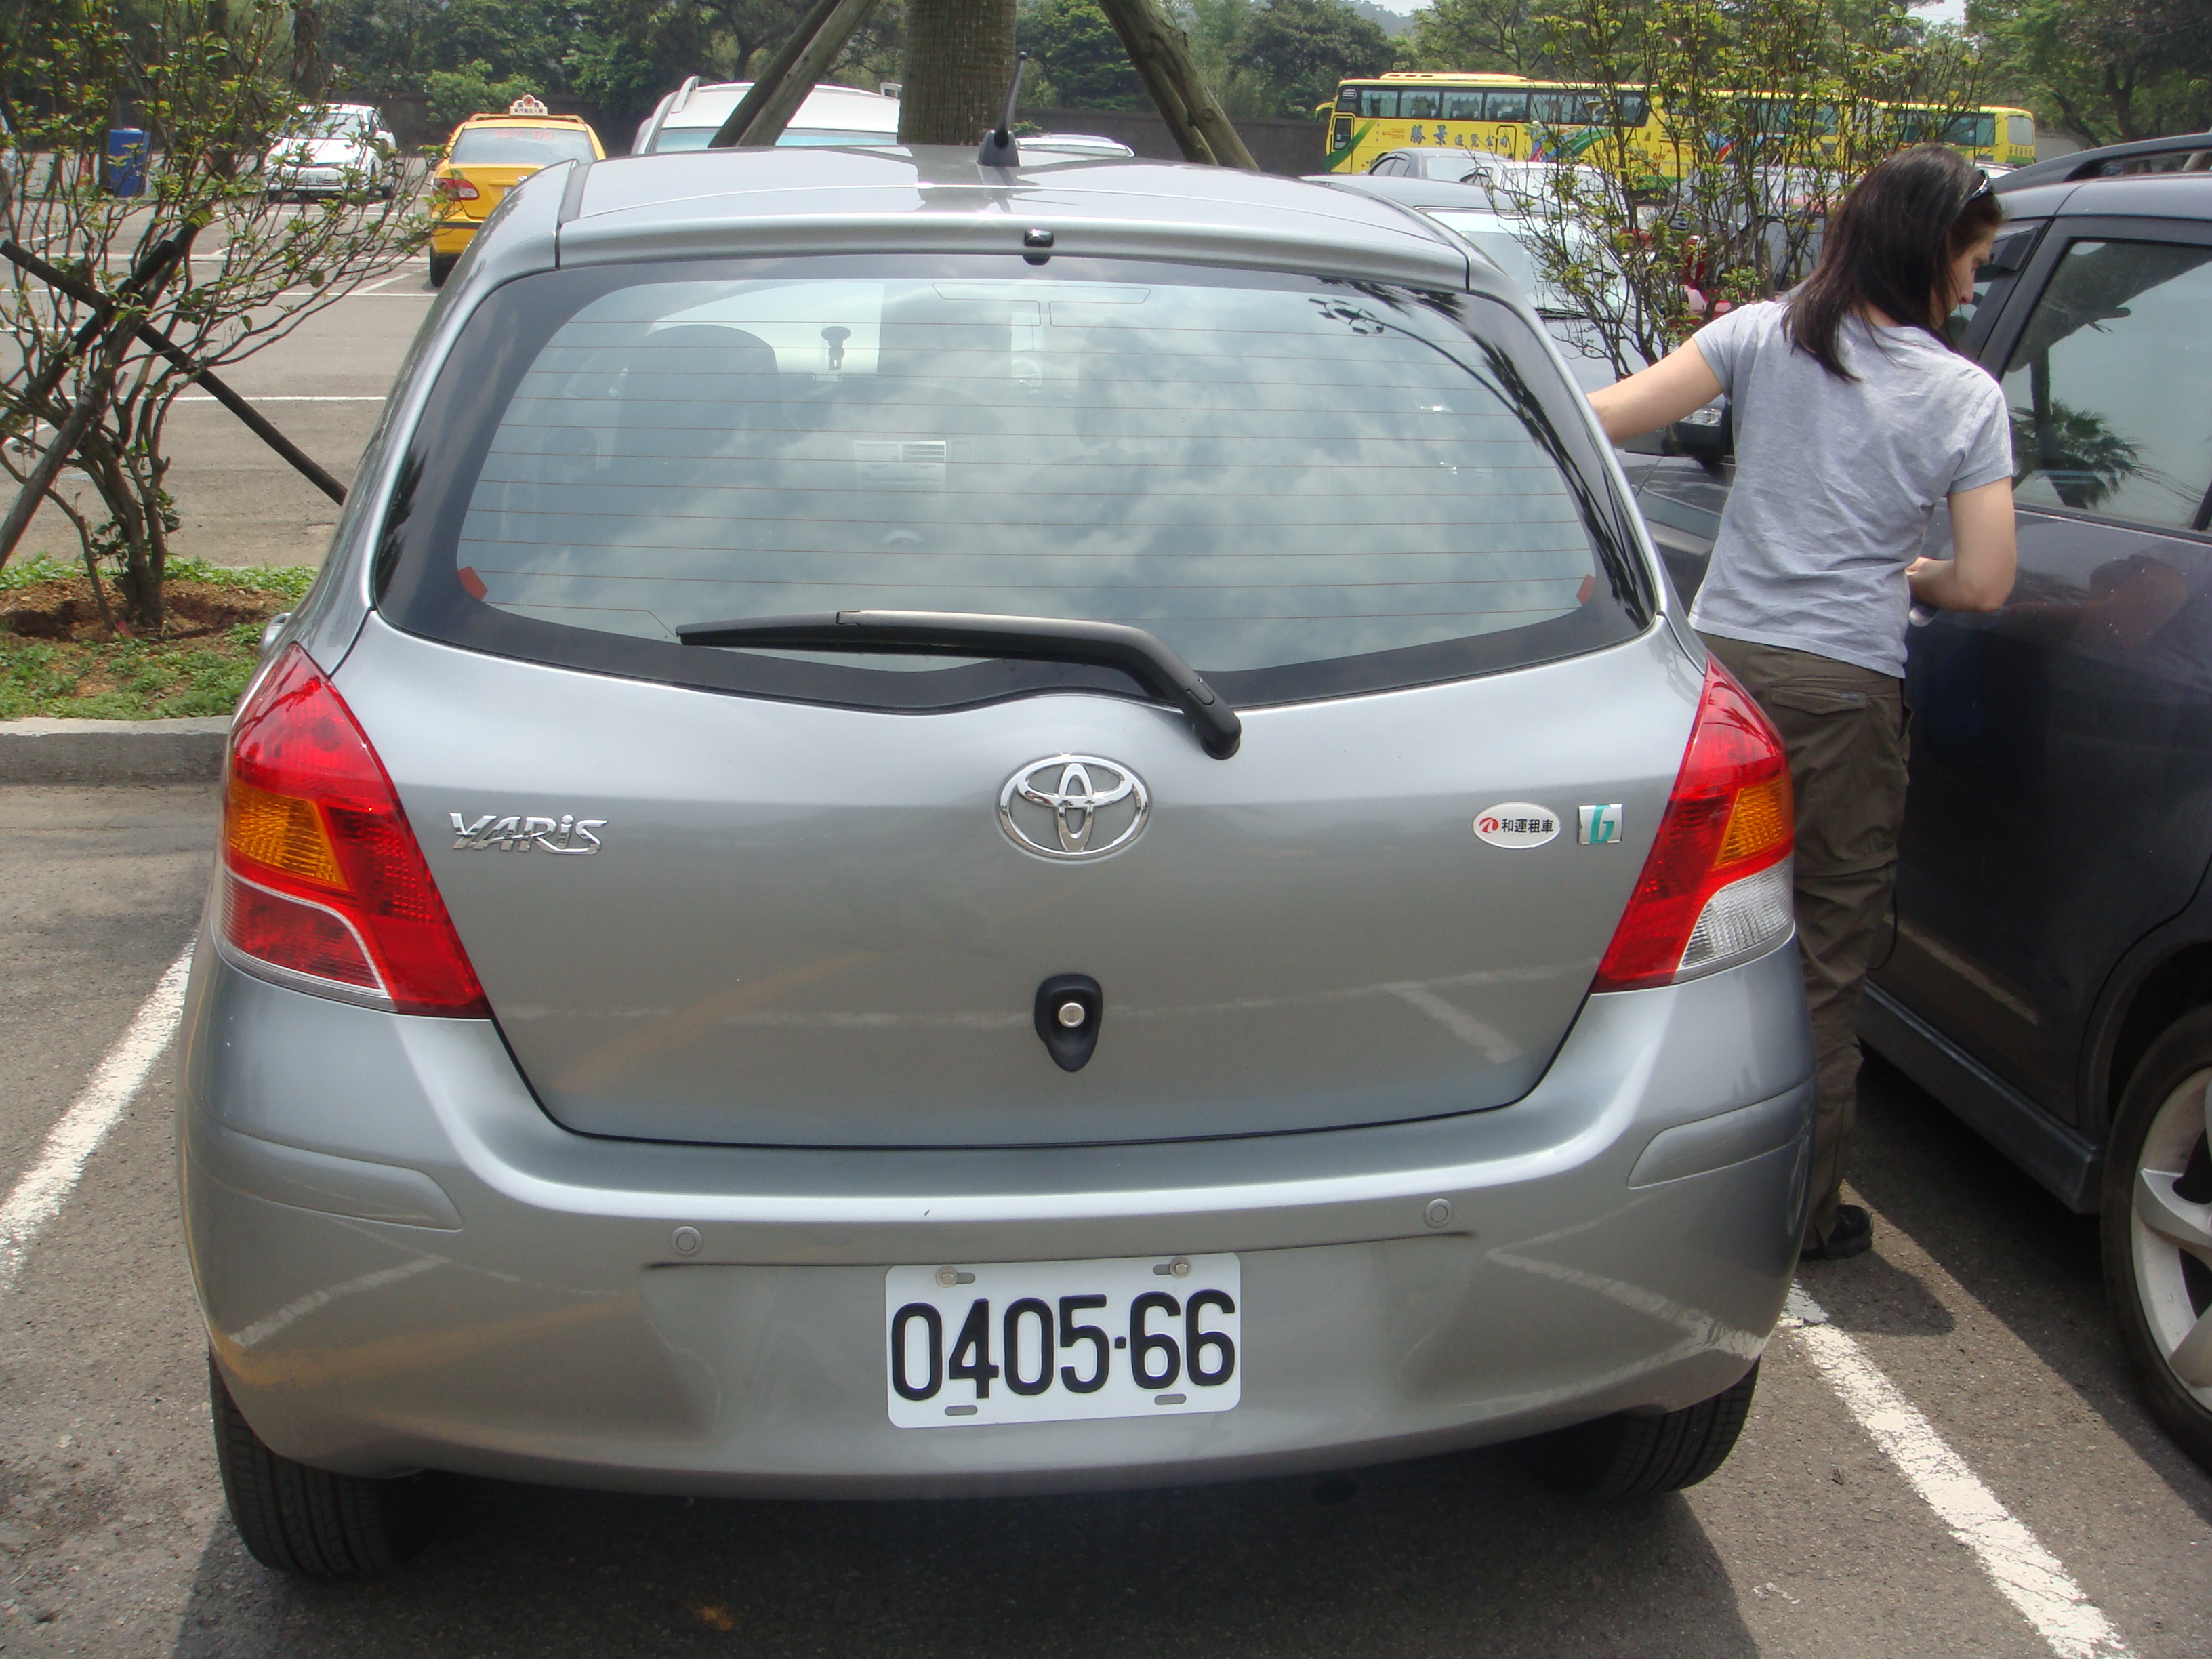 Hotai Car Rental